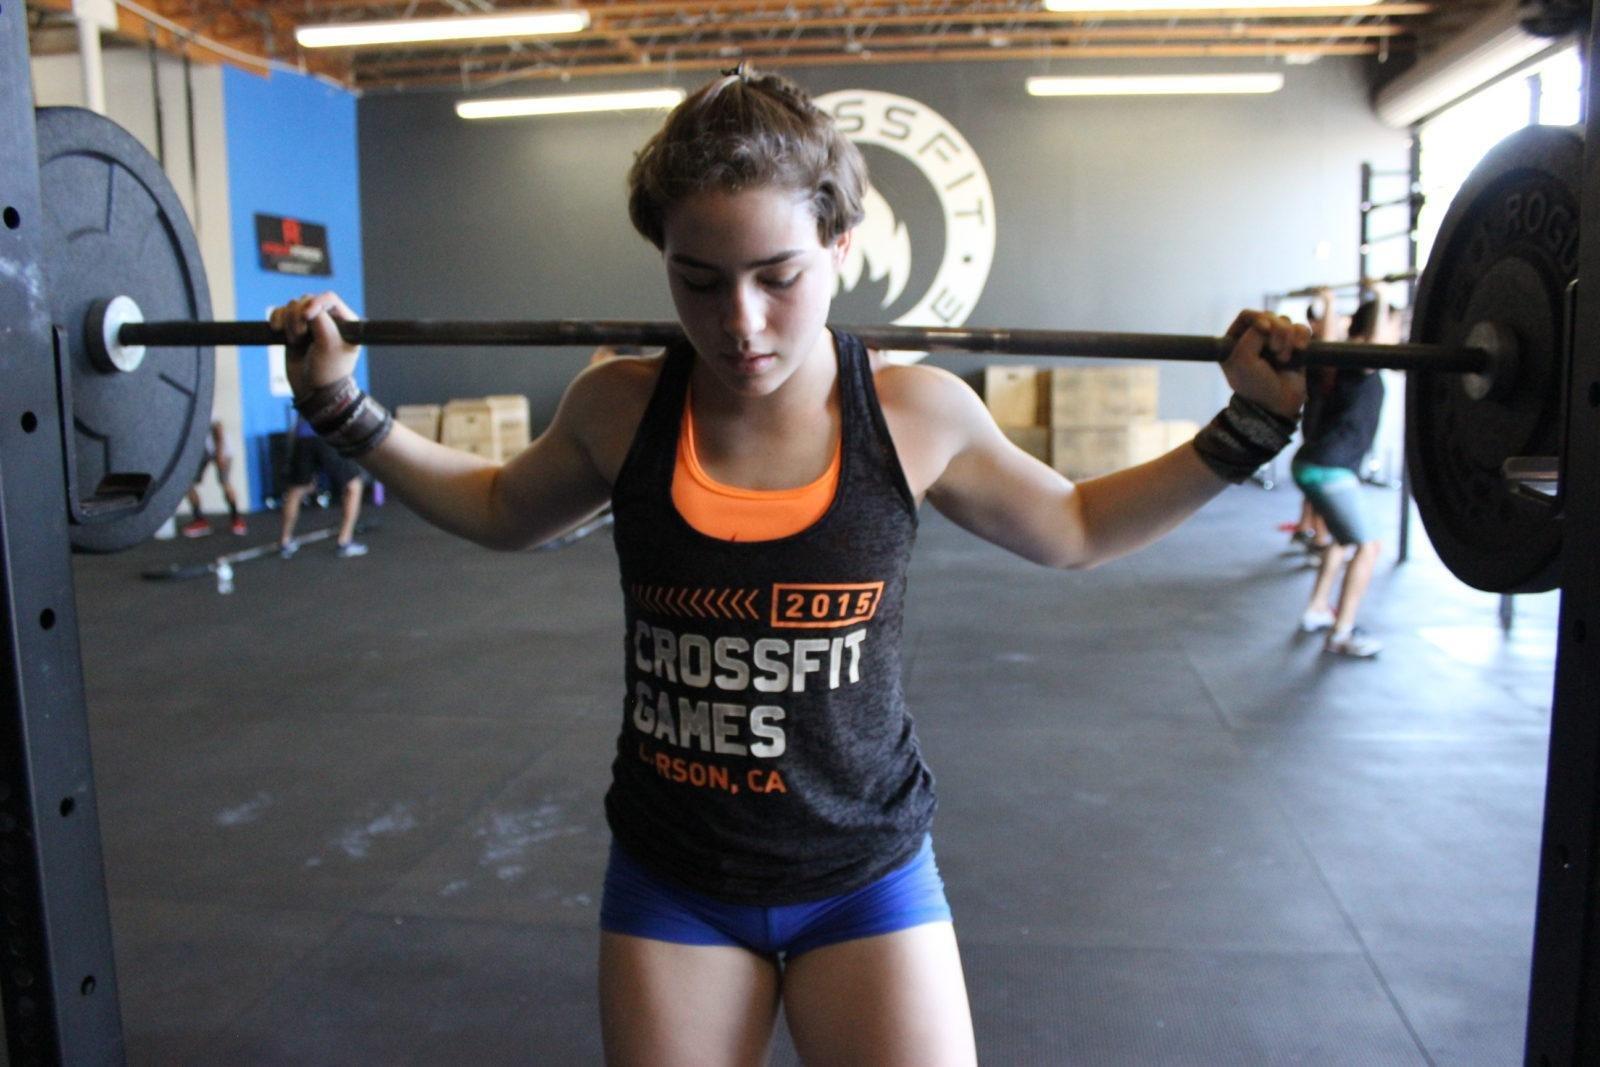 Marianna Rivera: Type 1 Diabetic & Crossfit Athlete